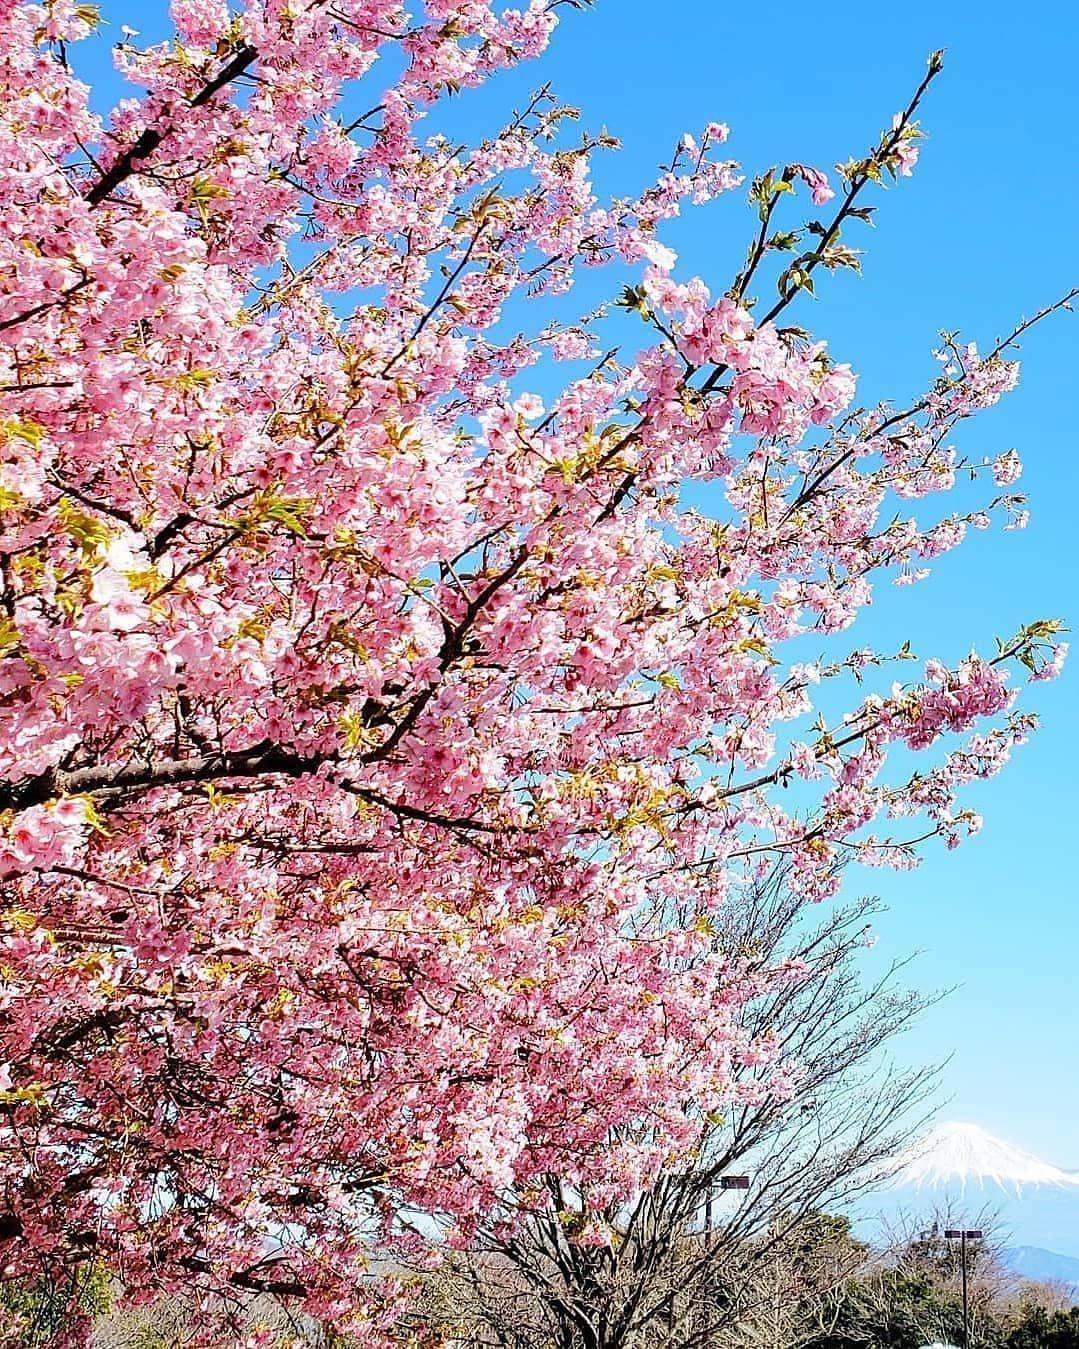 @Travelko: #スワイプしてね   \#早咲きの桜 と #富士山 の競演/  ここは #静岡、 #日本平 。かつて #日本観光地百選 で1位を獲得したこともある景勝地へ、...      #Instatravel, #Mtfuji, #Mtfujijapan, #SightSeeing, #Travel, #Travelko, #Trip, #いちばん安く, #カメラ女子, #スワイプしてね, #トラベルコ, #トラベルコちゃん, #フォトジェニック, #一人旅, #久能山東照宮, #国内旅�